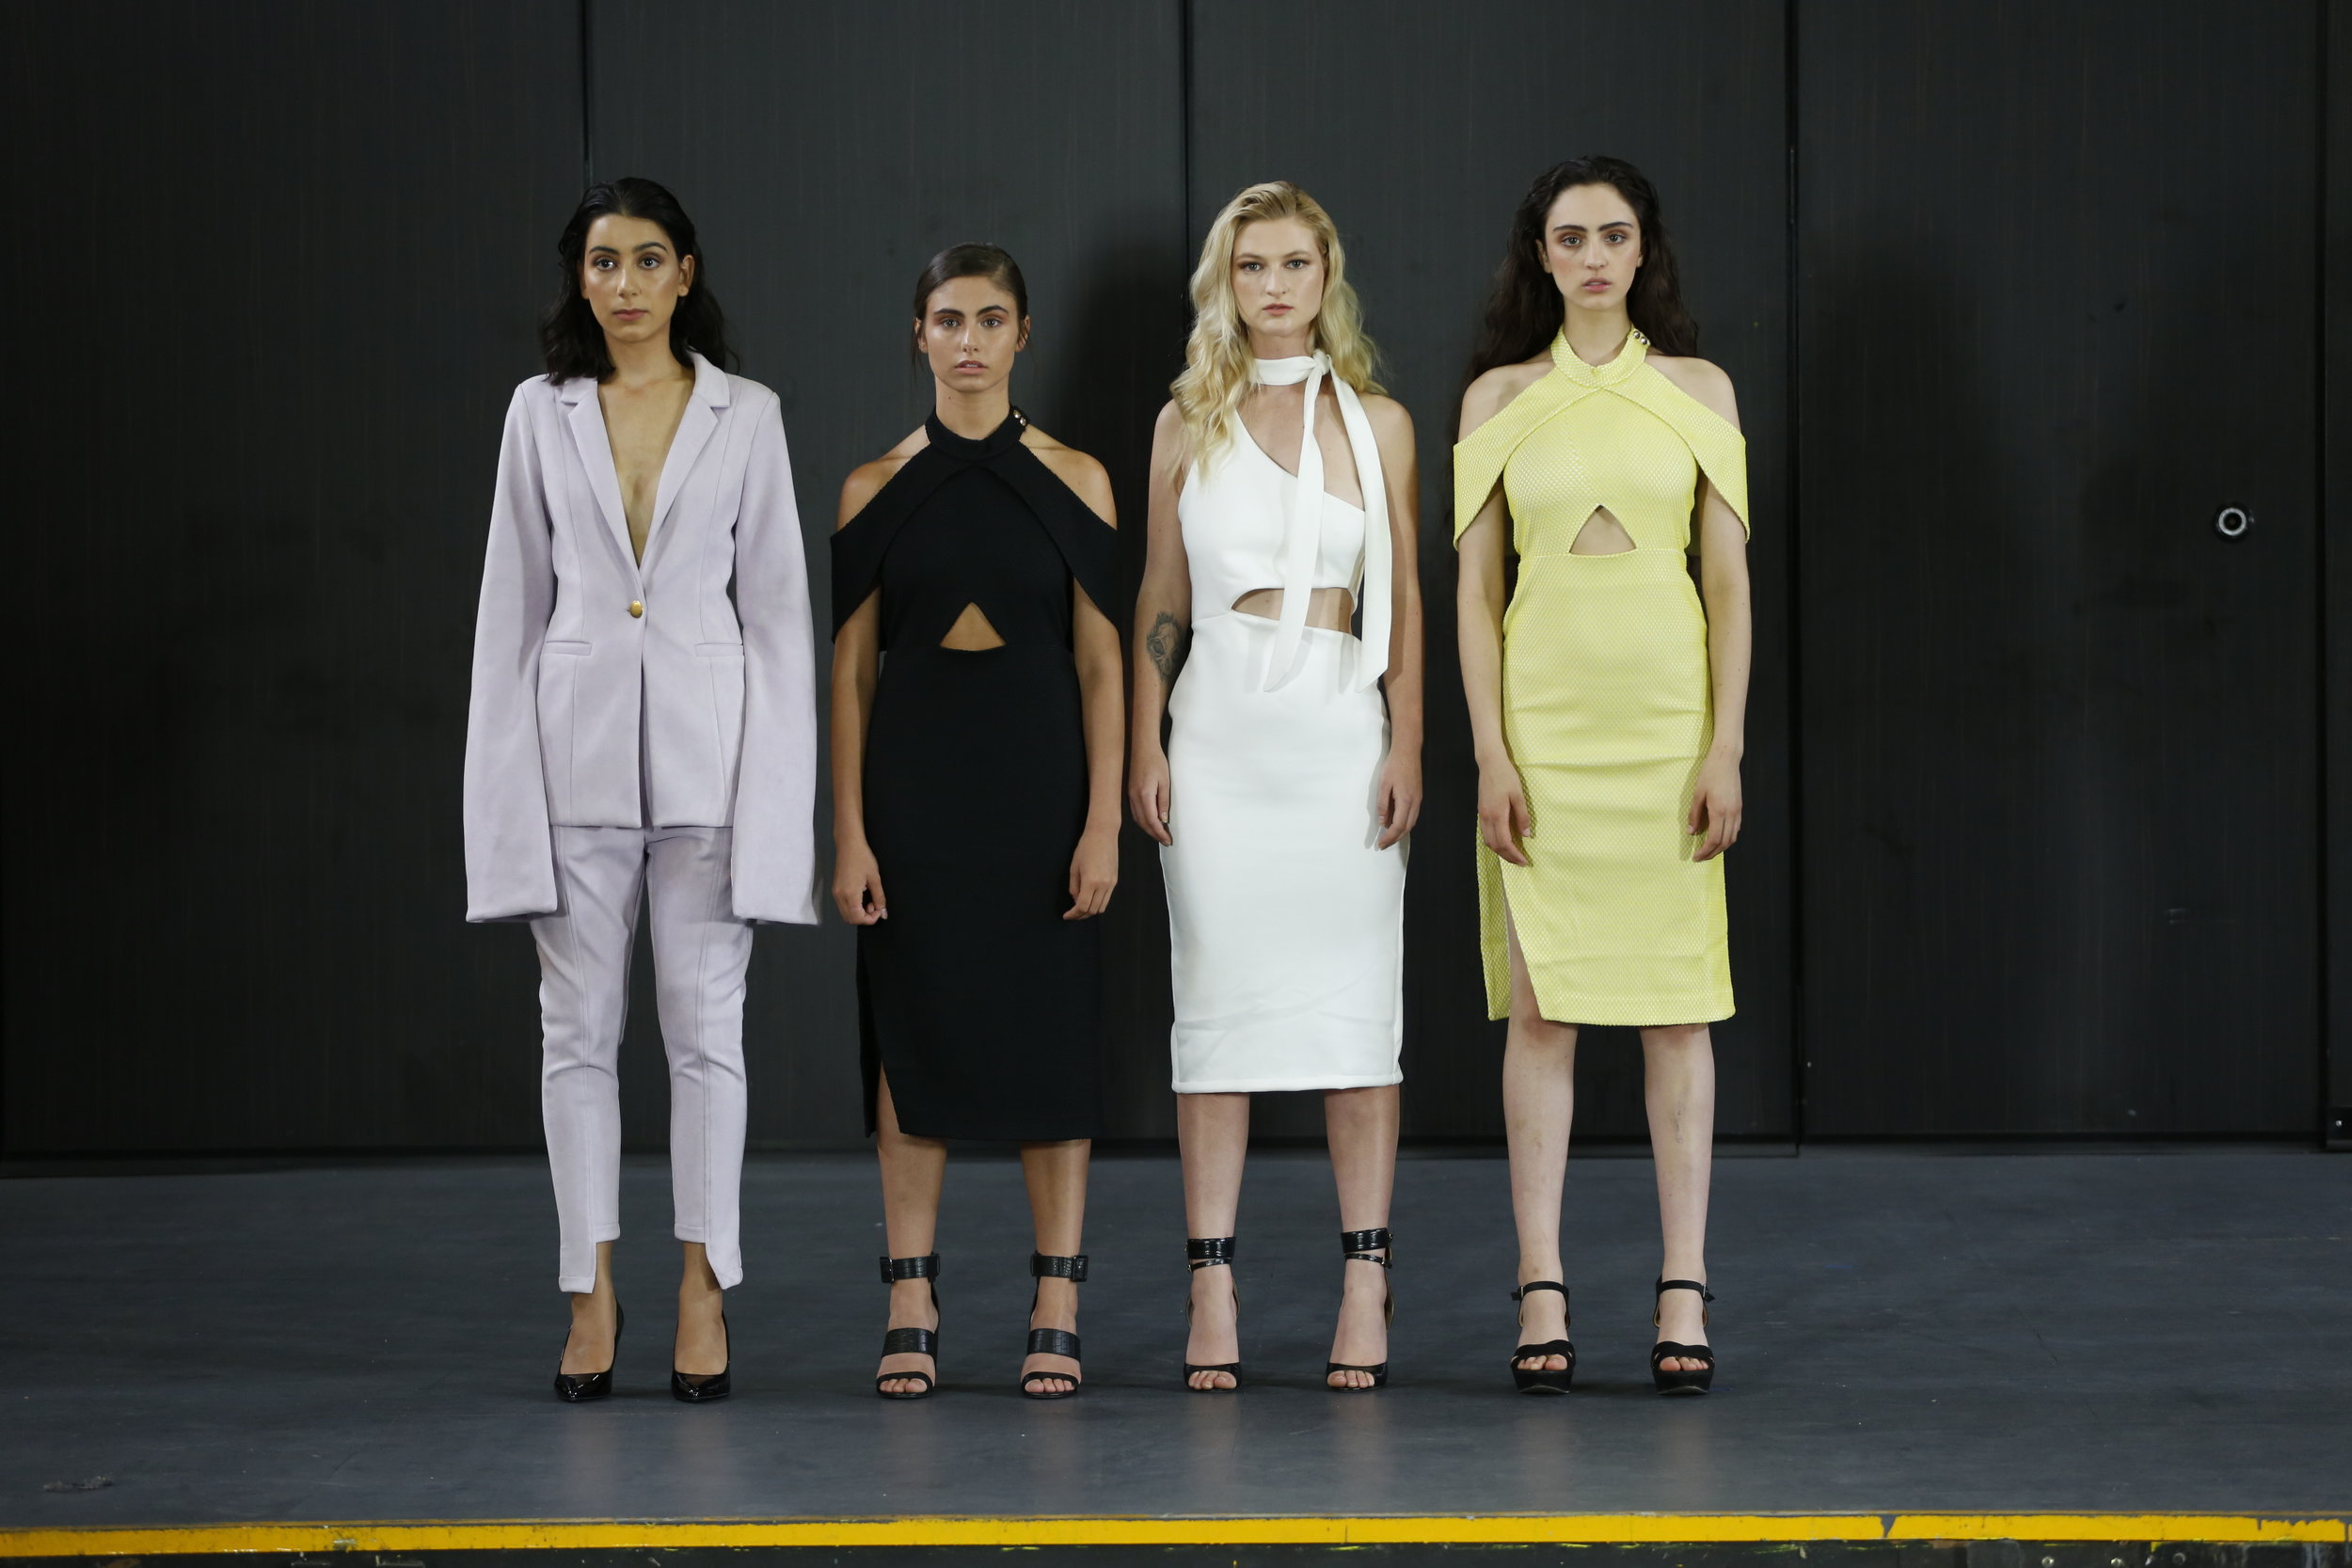 Face Fashion Runway and Market